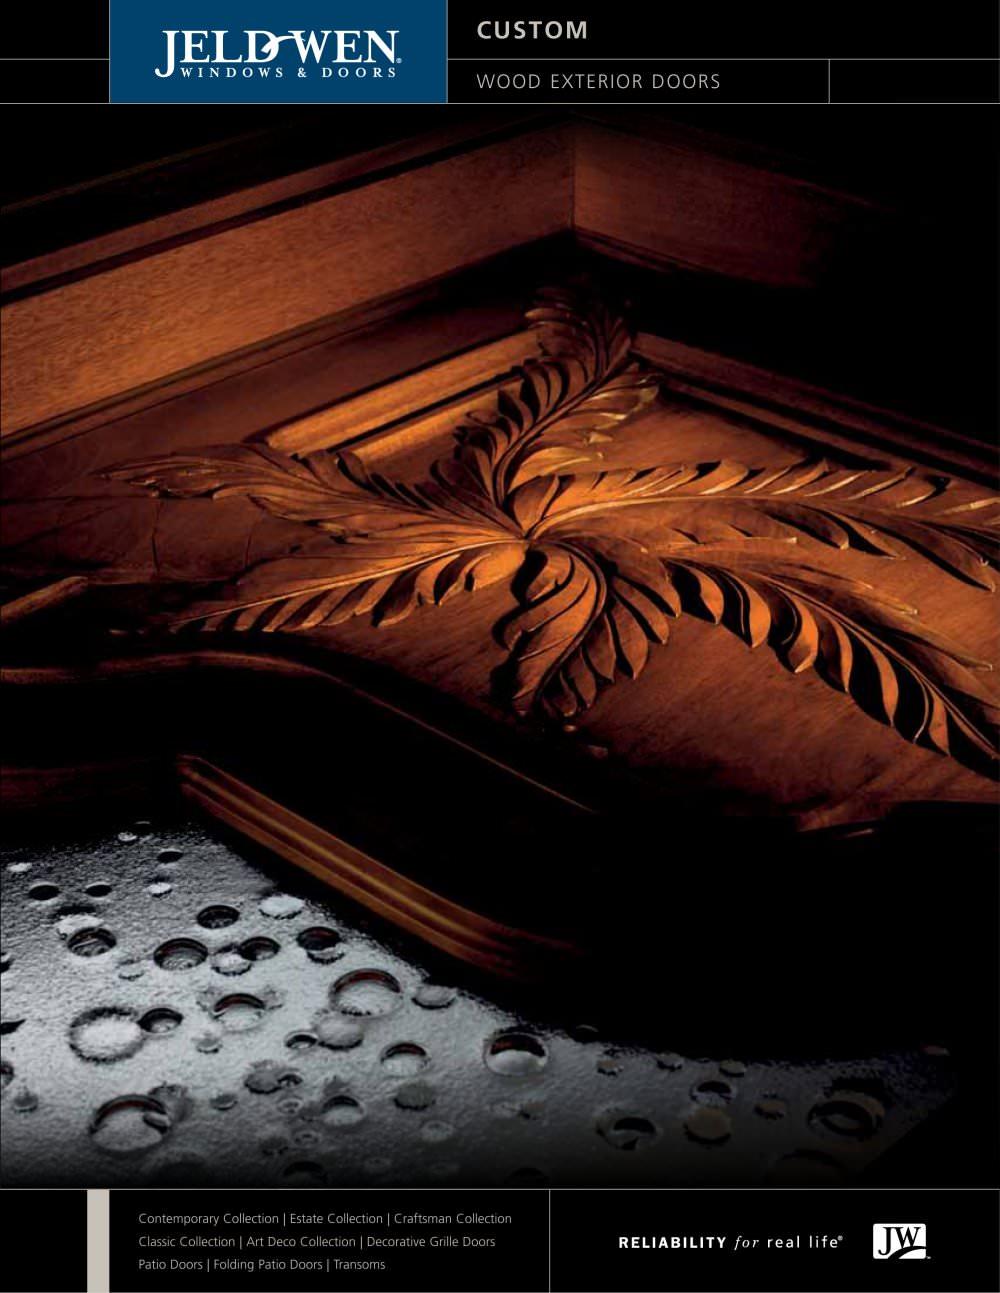 Custom Wood Exterior Doors - JELD-WEN - PDF Catalogues ...